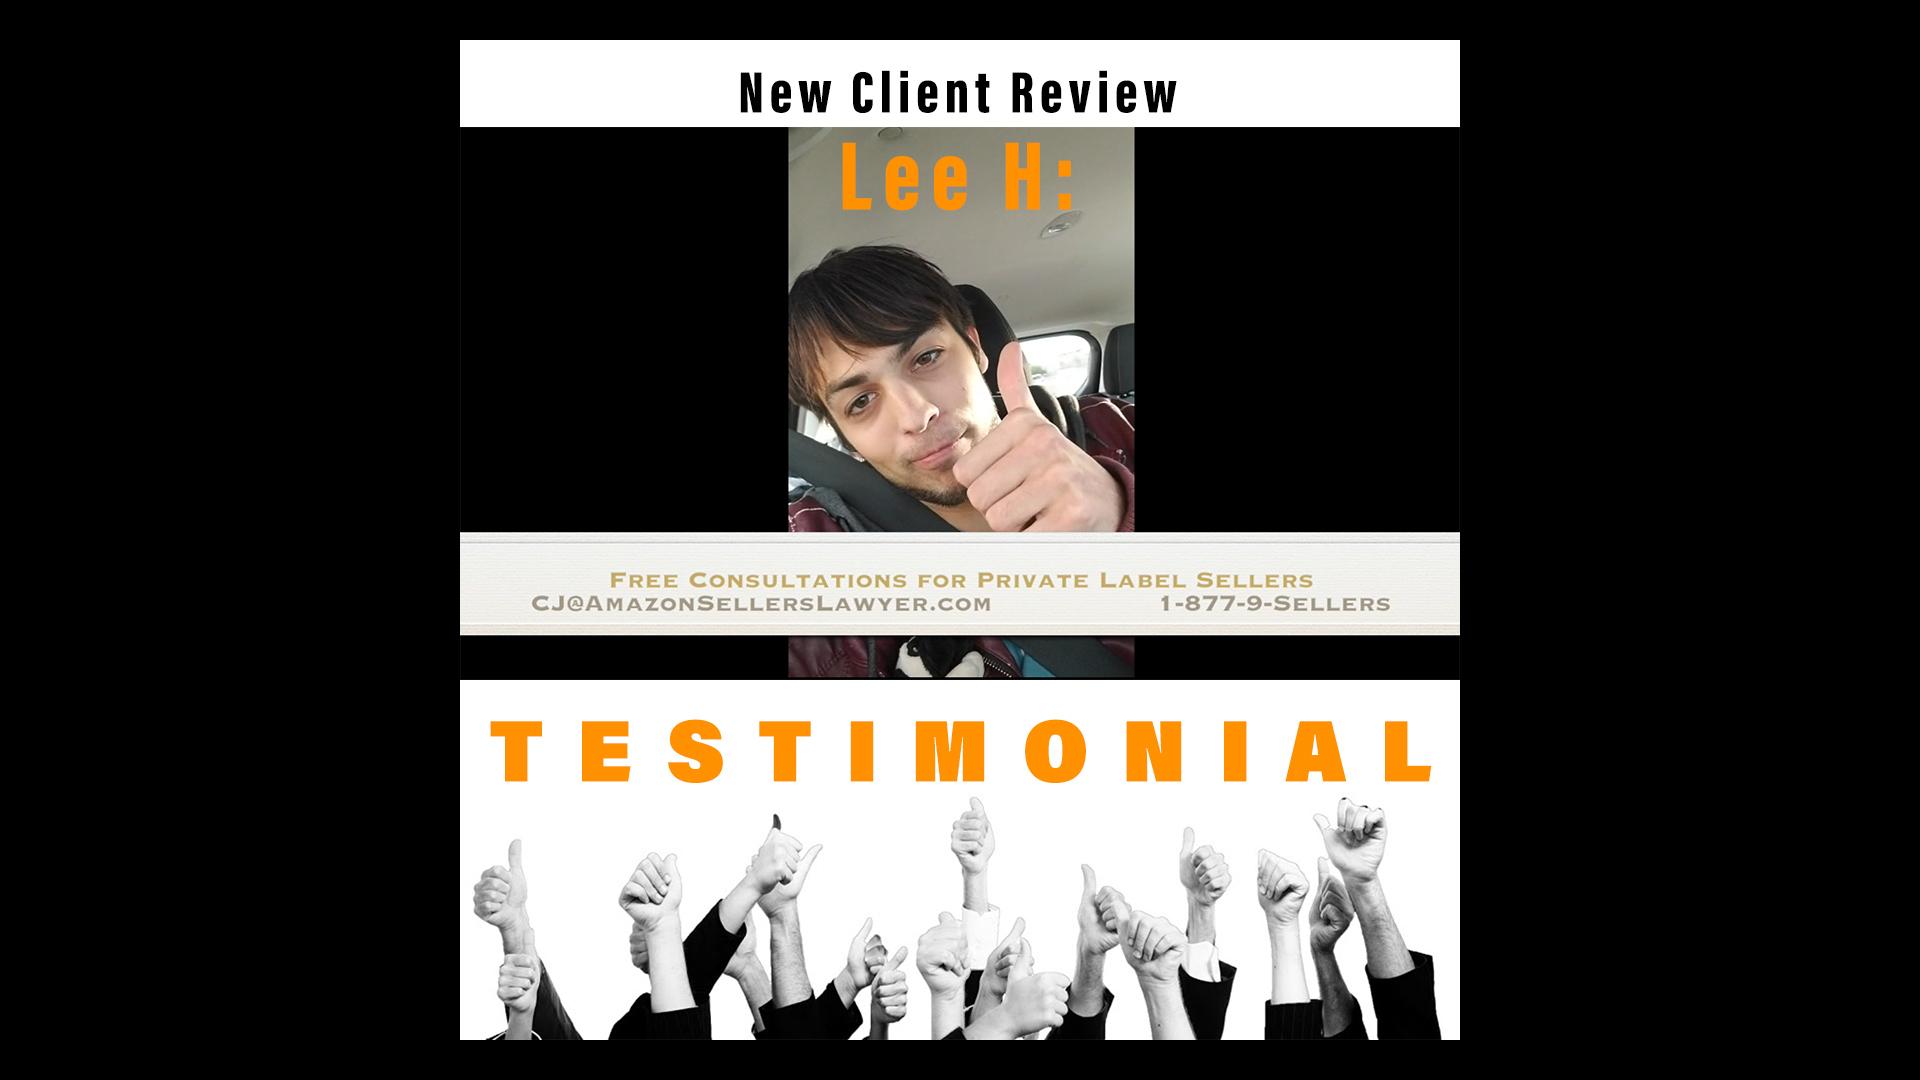 Testimonial: brand development & protection